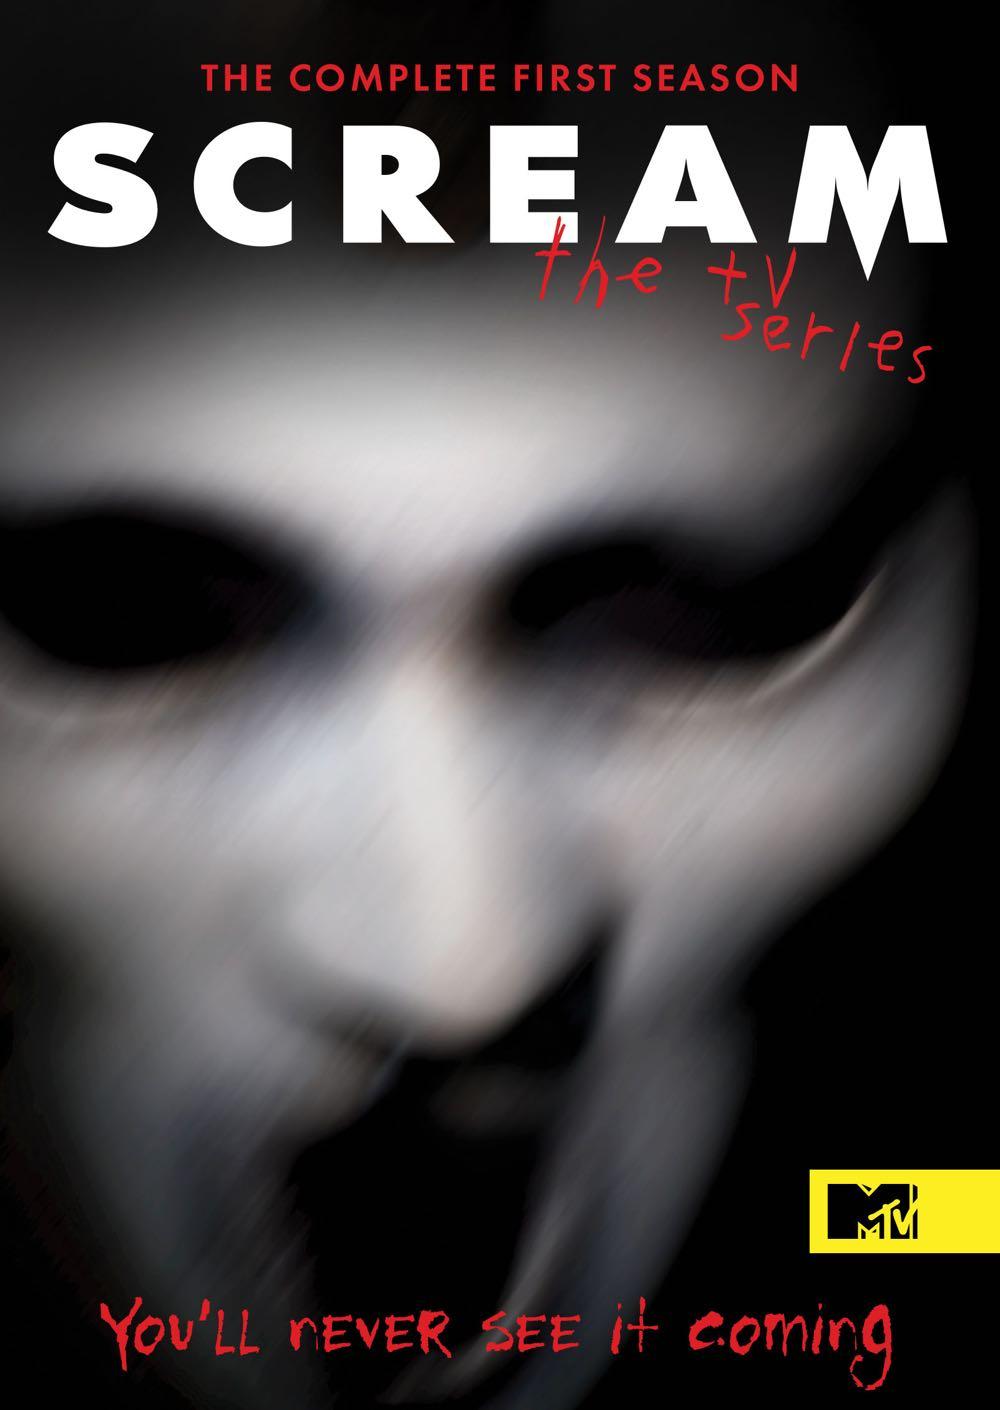 Scream Season 1 DVD TV Series